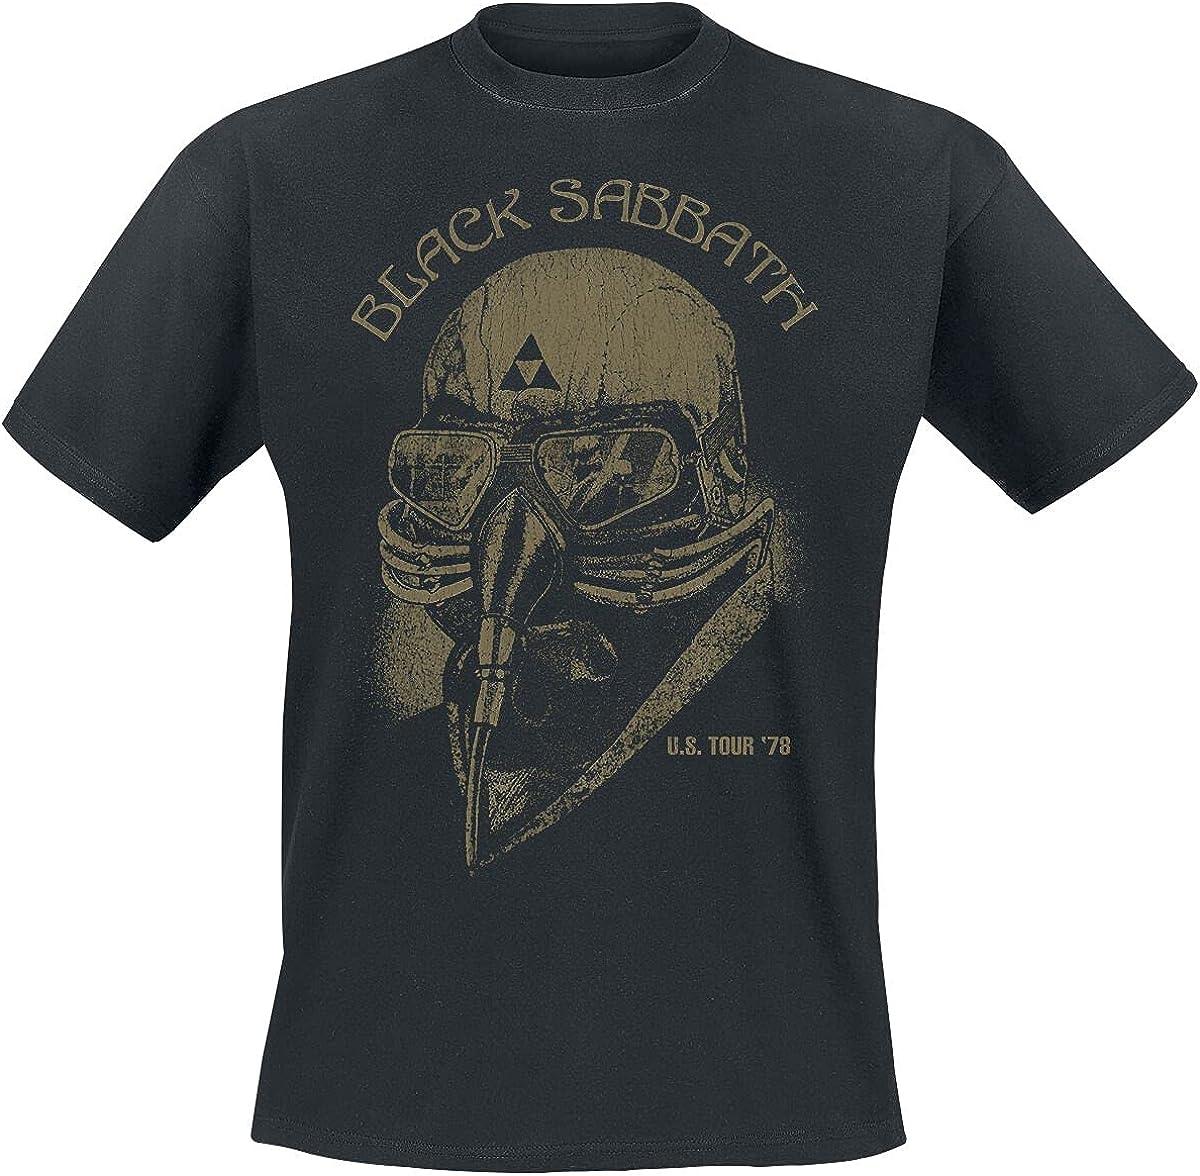 Black Sabbath U.S. Tour '78 Hombre Camiseta Negro, Regular